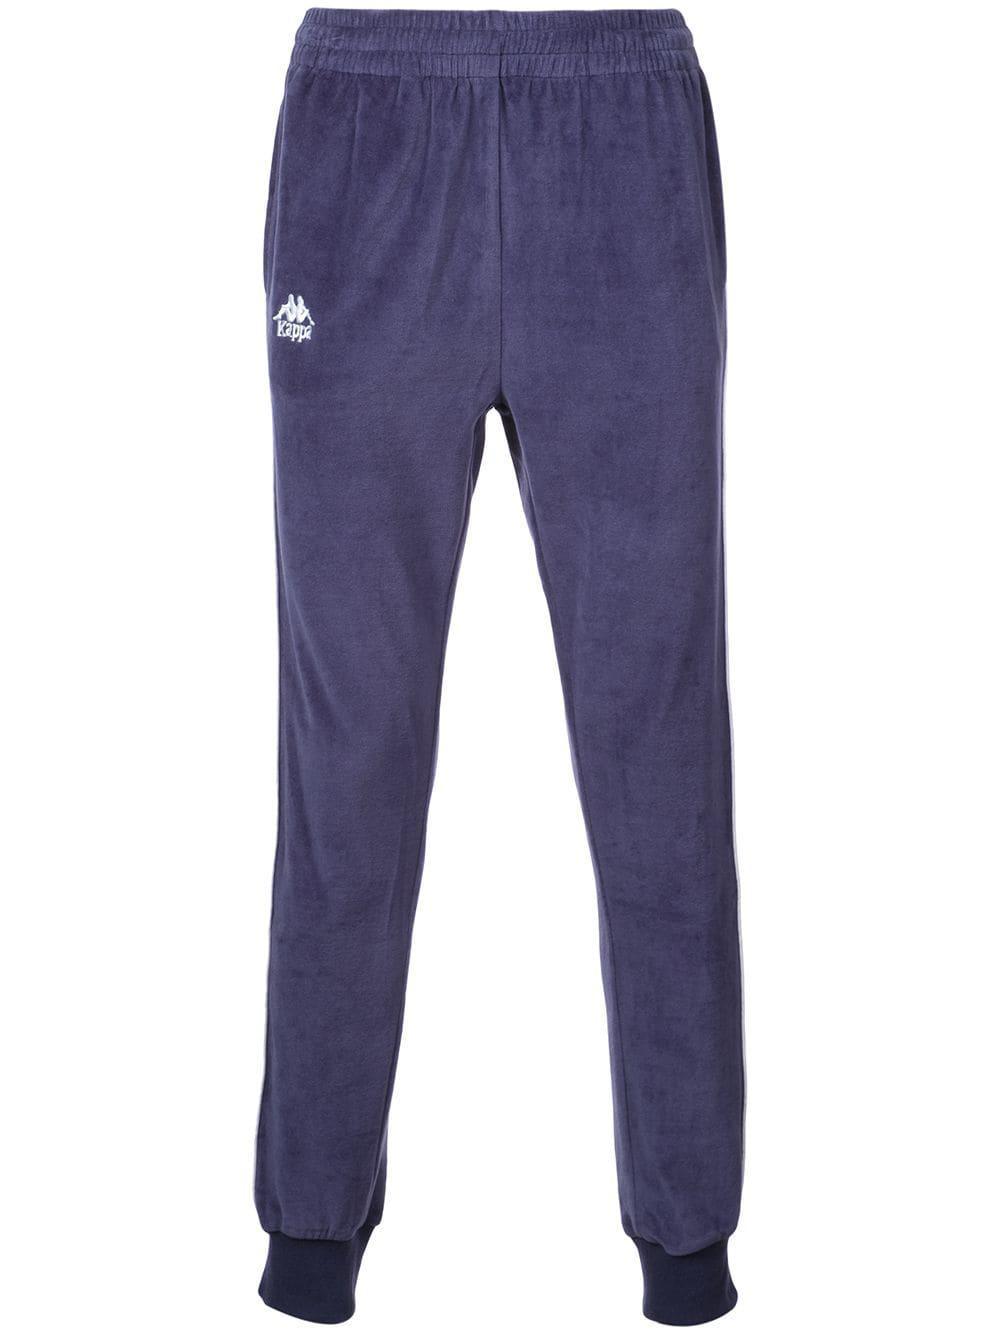 Kappa Side Panelled Track Pants - Blue